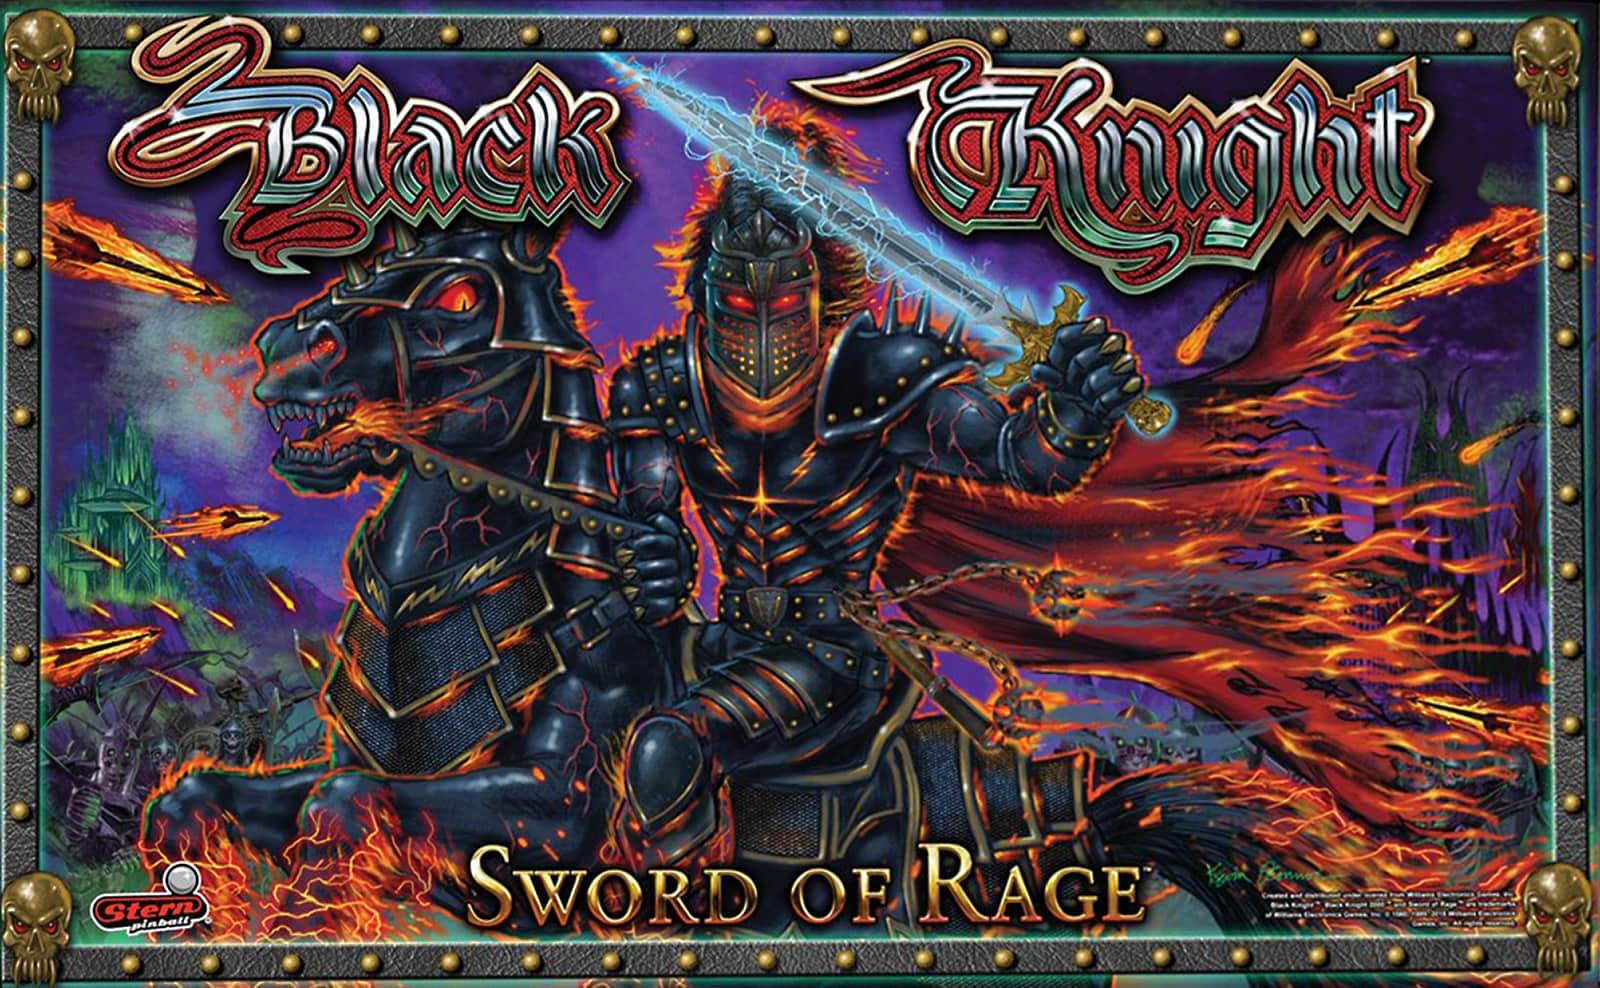 Black Knight Sword of Rage Pinball Backglass